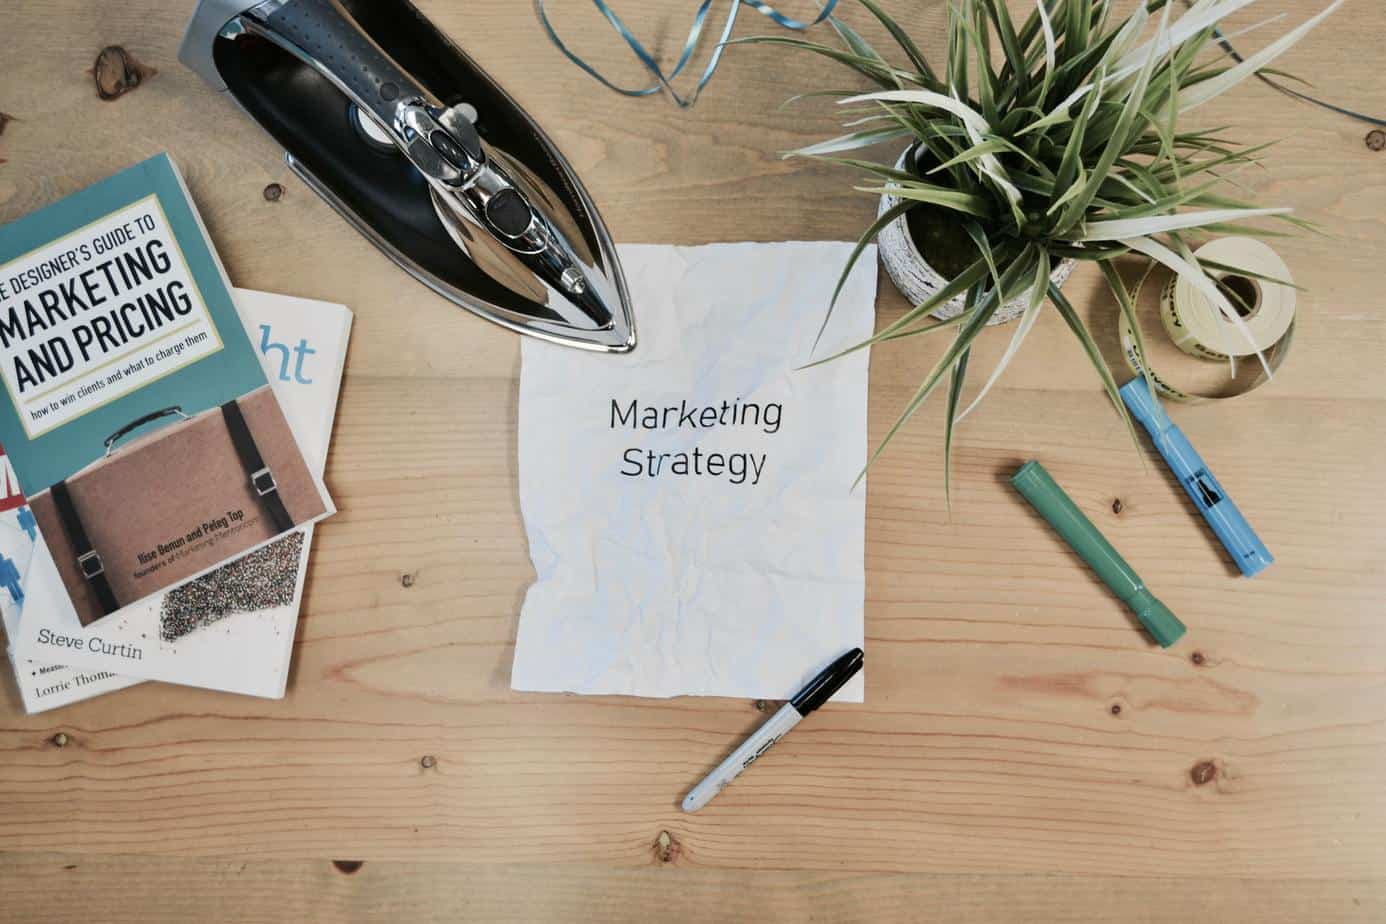 Ironing Marketing Strategy - Photo by Campaign Creators on Unsplash